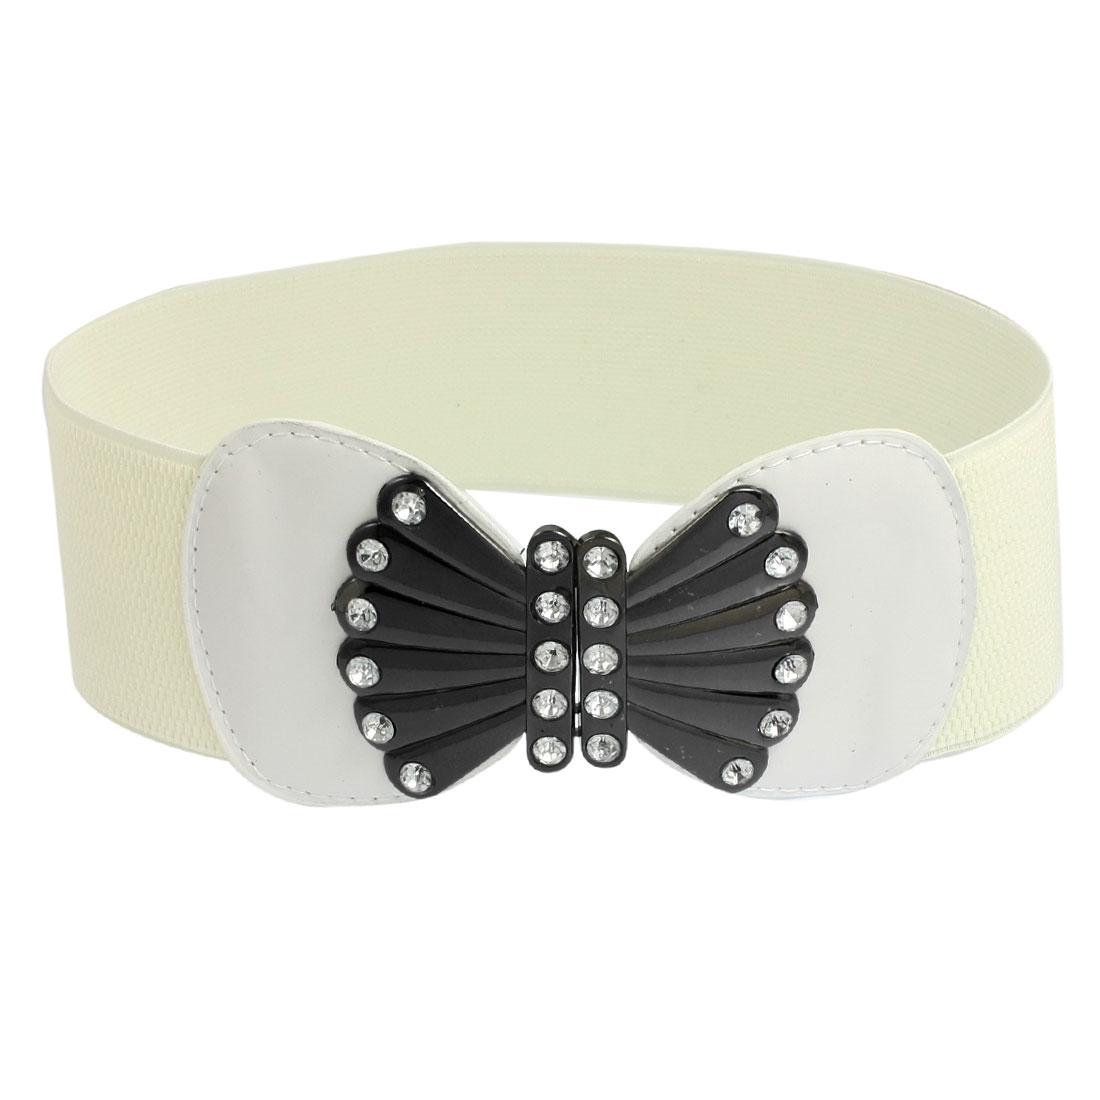 Women Bowknot Interlocking Buckle Off White Stretch Waist Belt Cinch Waistband